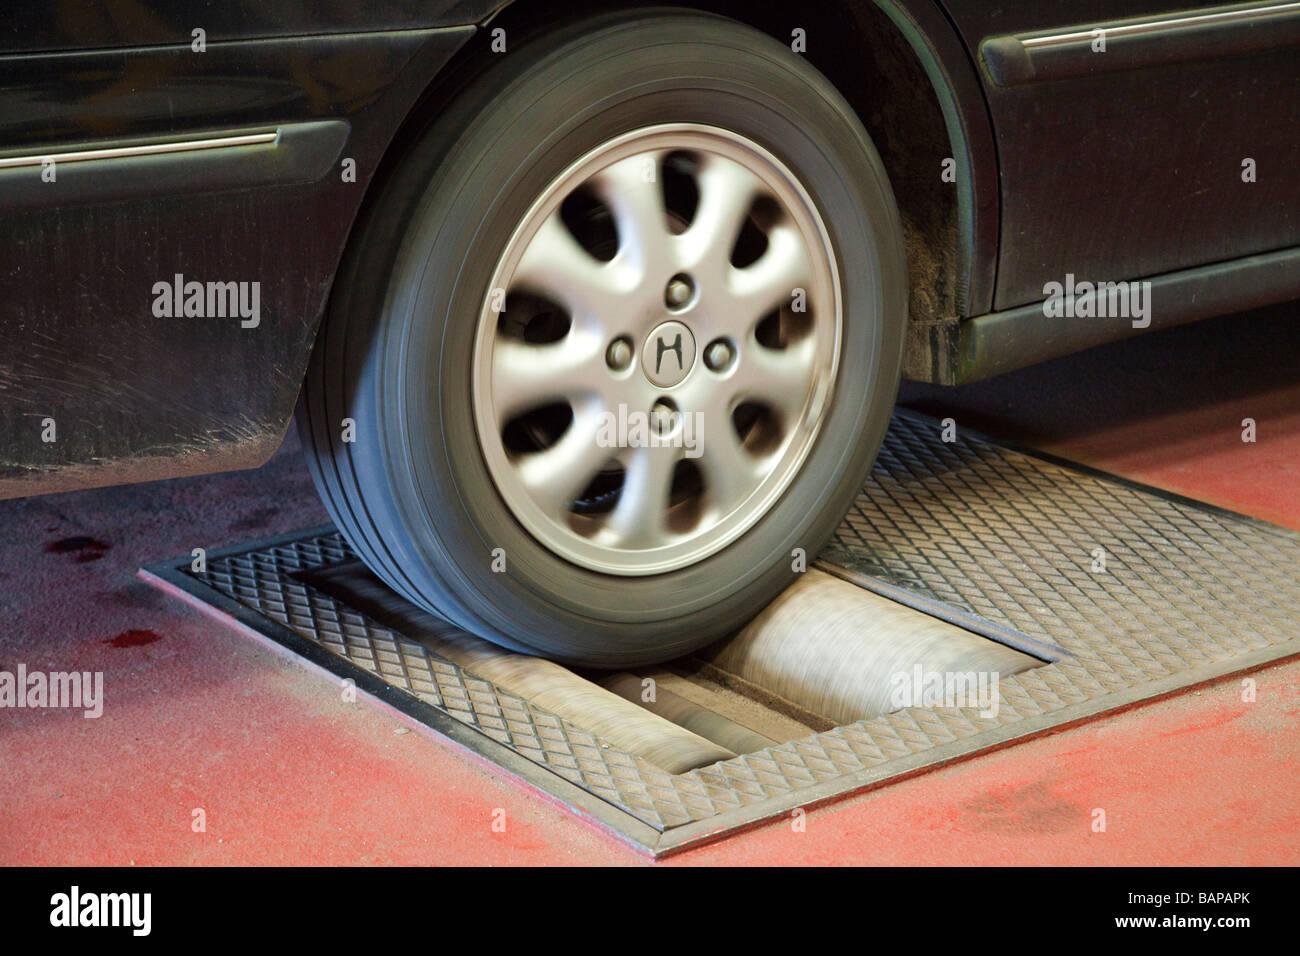 Car Brake Test : Car on a rolling road dynamometer to check brake